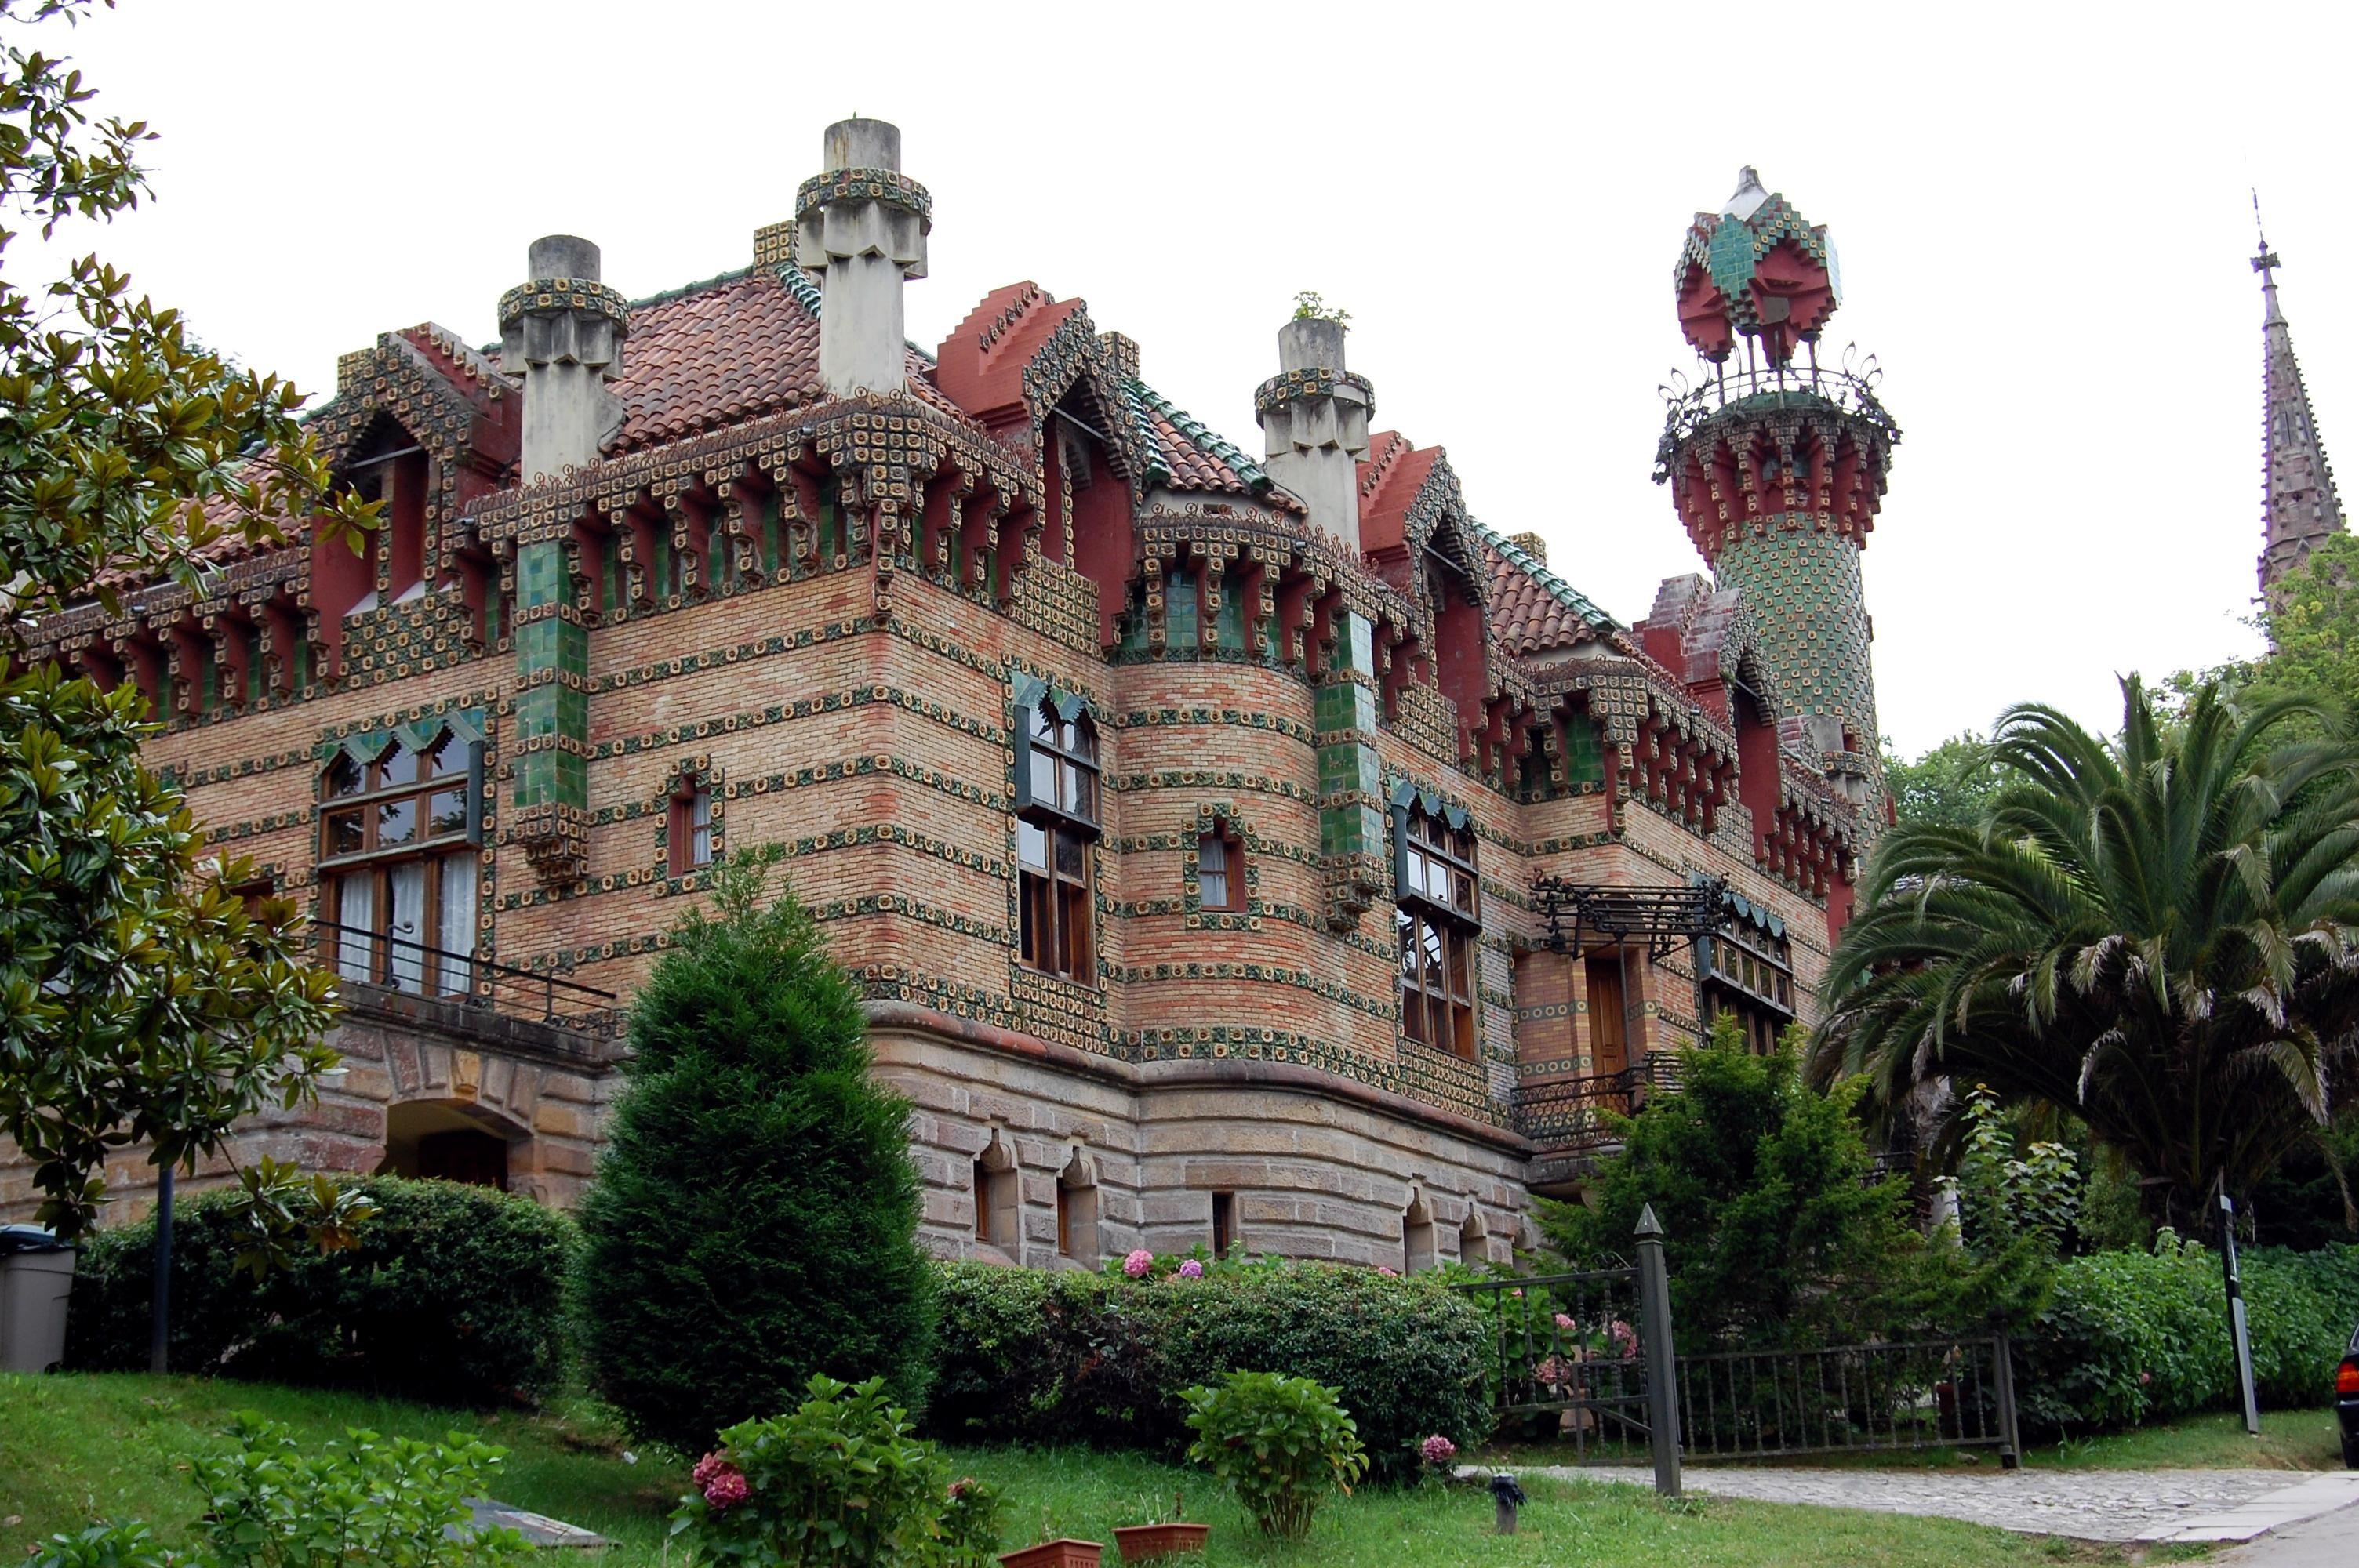 El Capricho- Gaudi   Gaudi, Antonio gaudi, Arquitectura